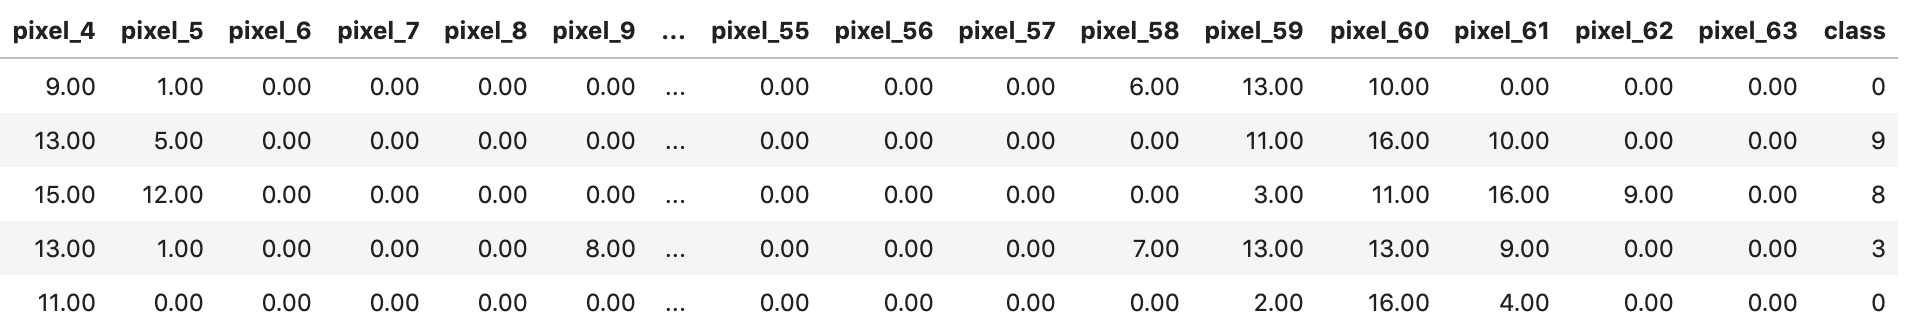 digits predicted dataset